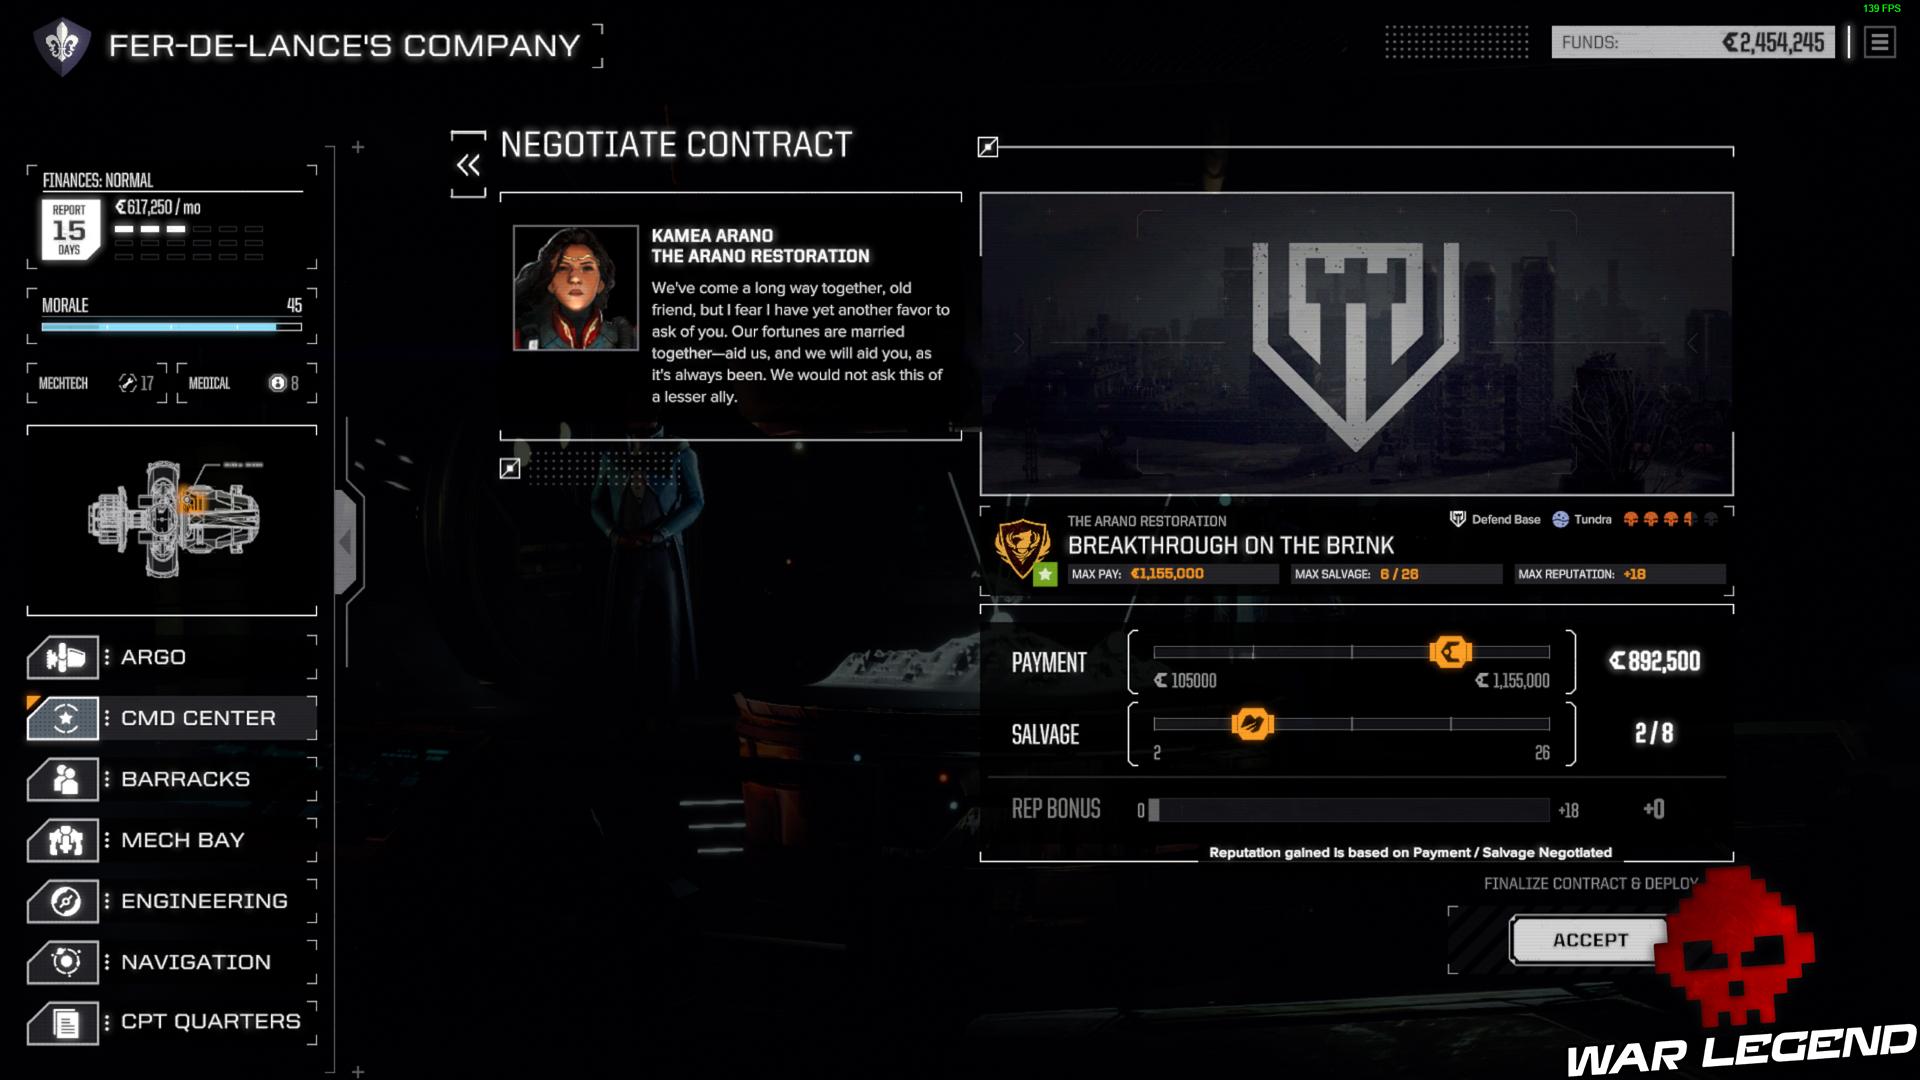 négociation contrat